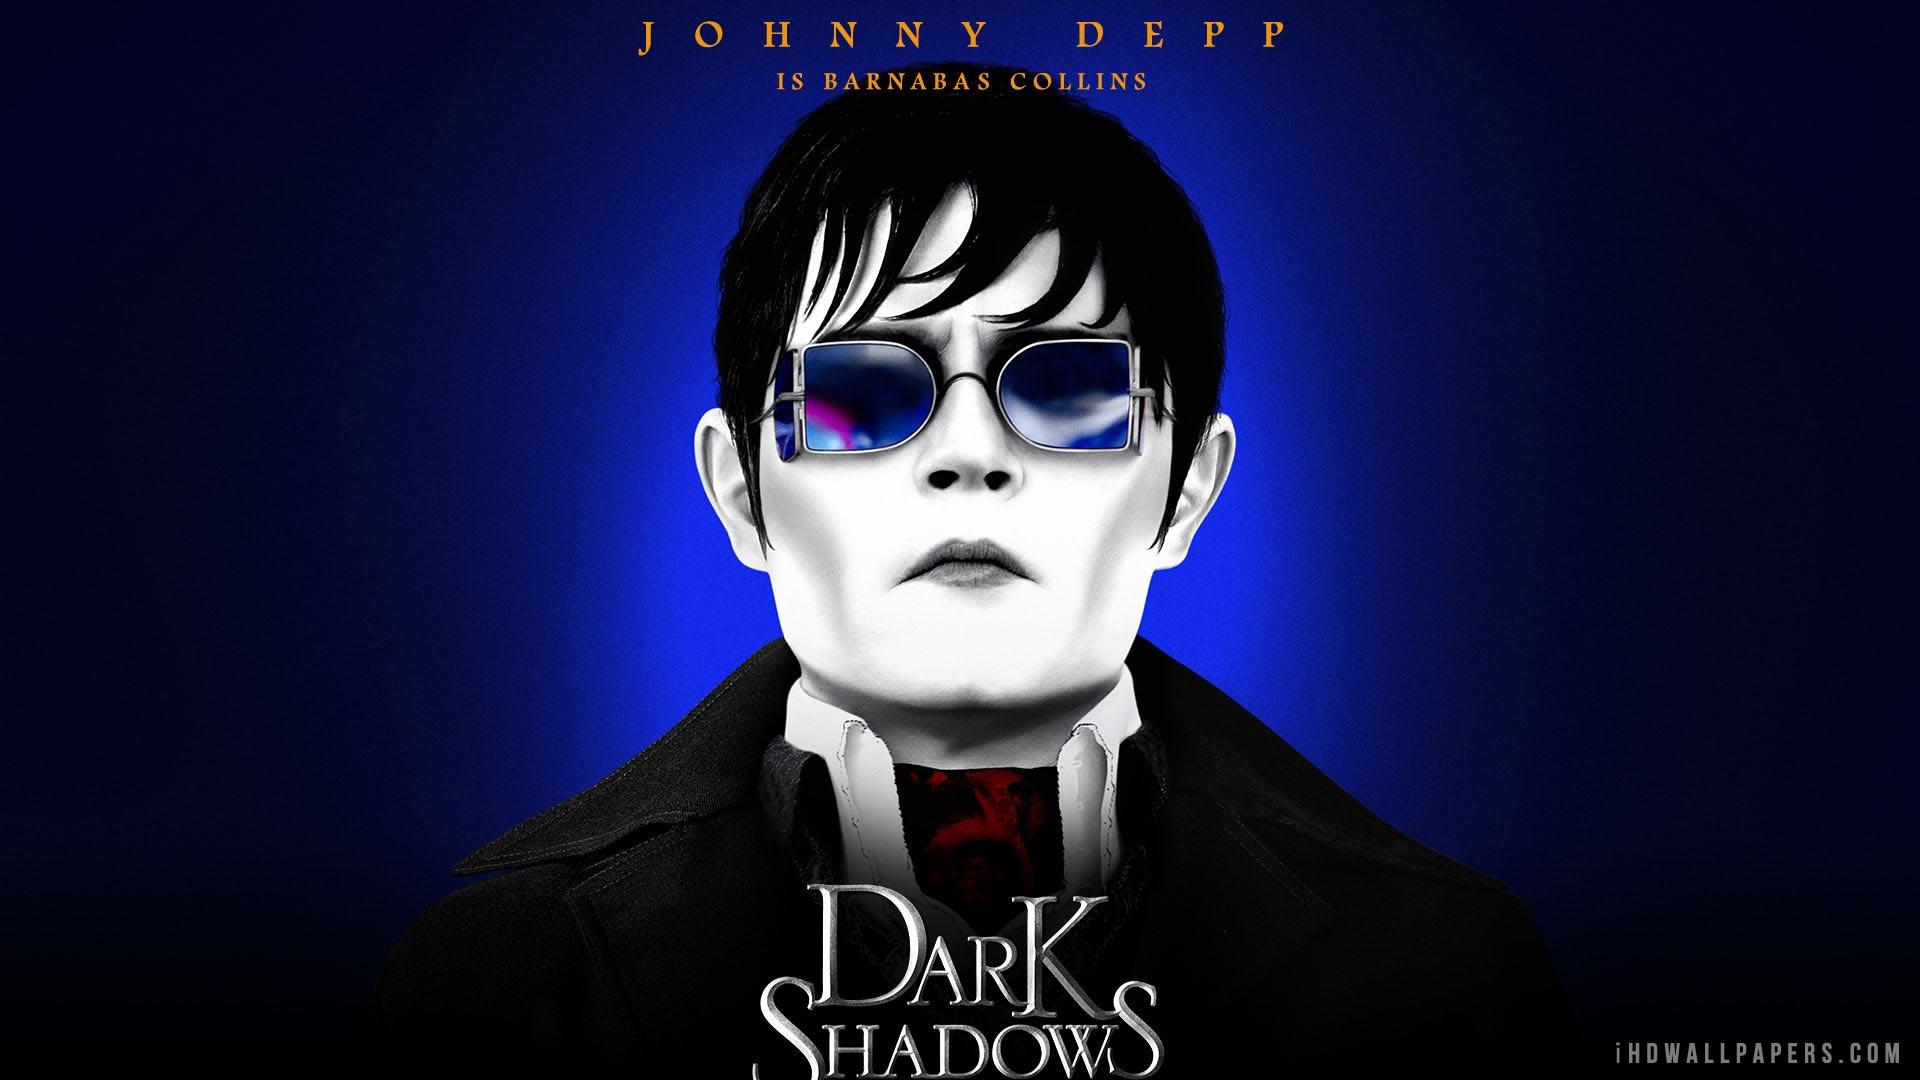 Johnny Depp in Dark Shadows HD Wallpaper   iHD Wallpapers 1920x1080